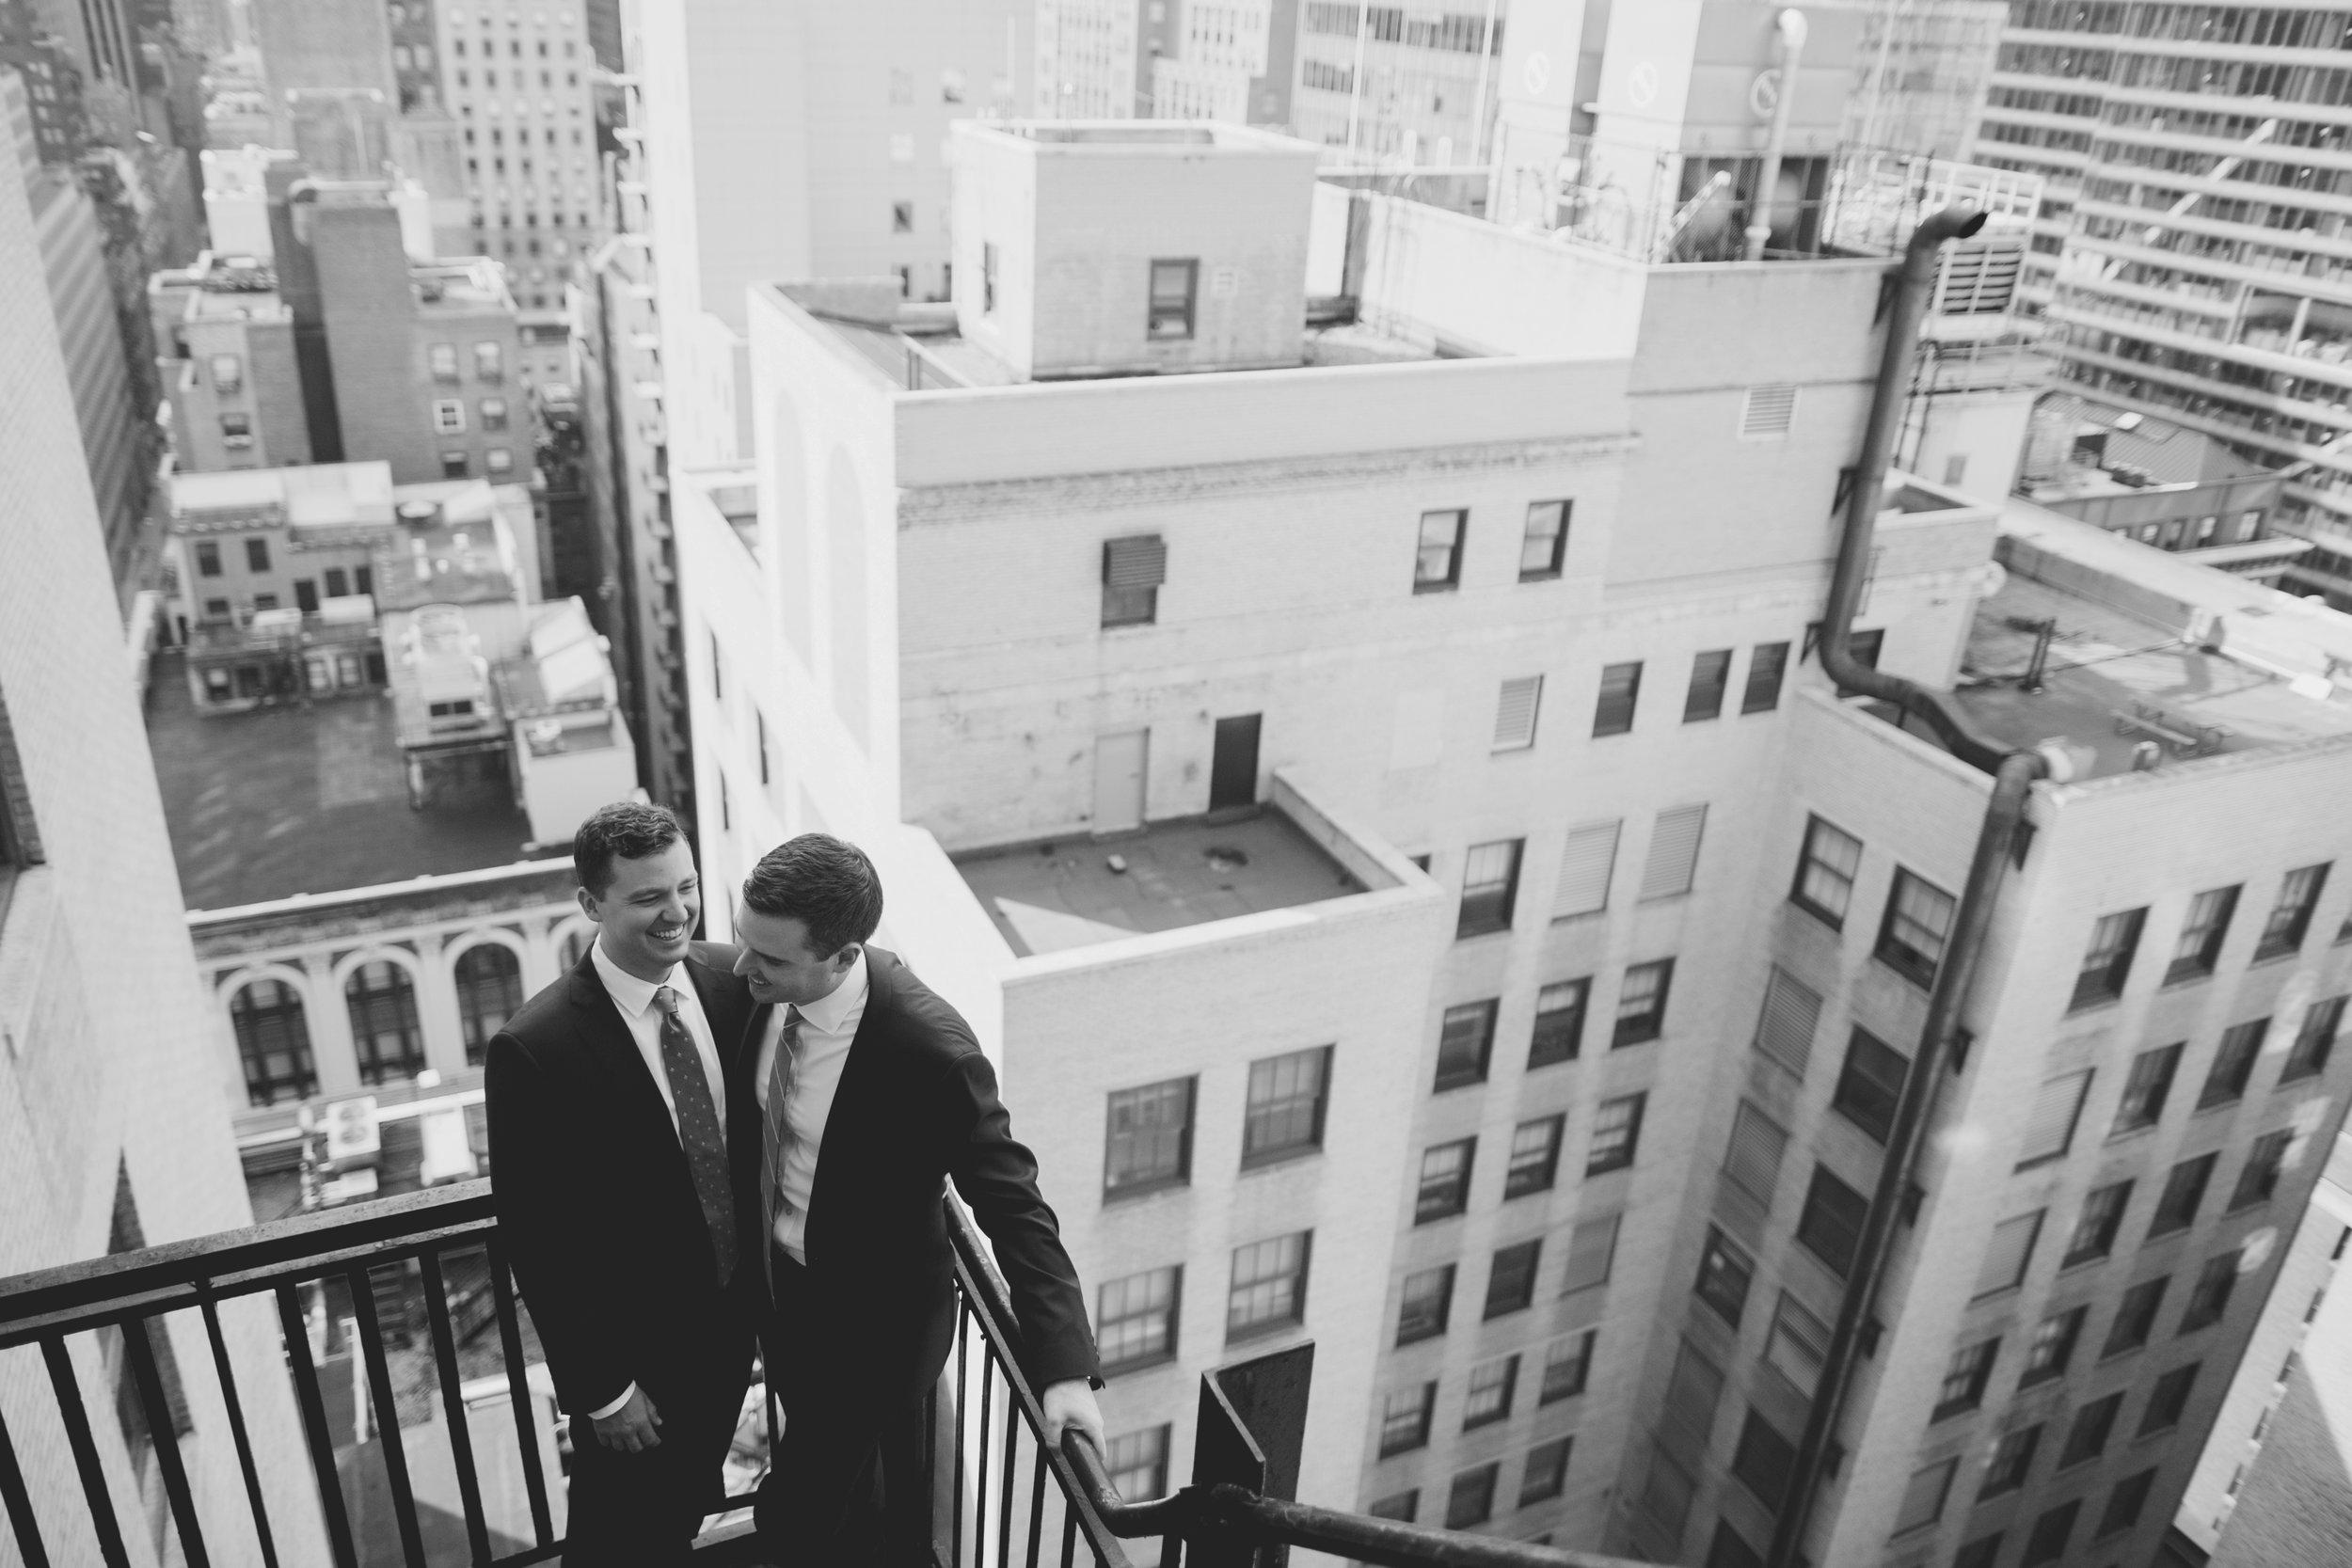 amanda_vanvels_new_york_lgbtq_gay_wedding_026.jpg